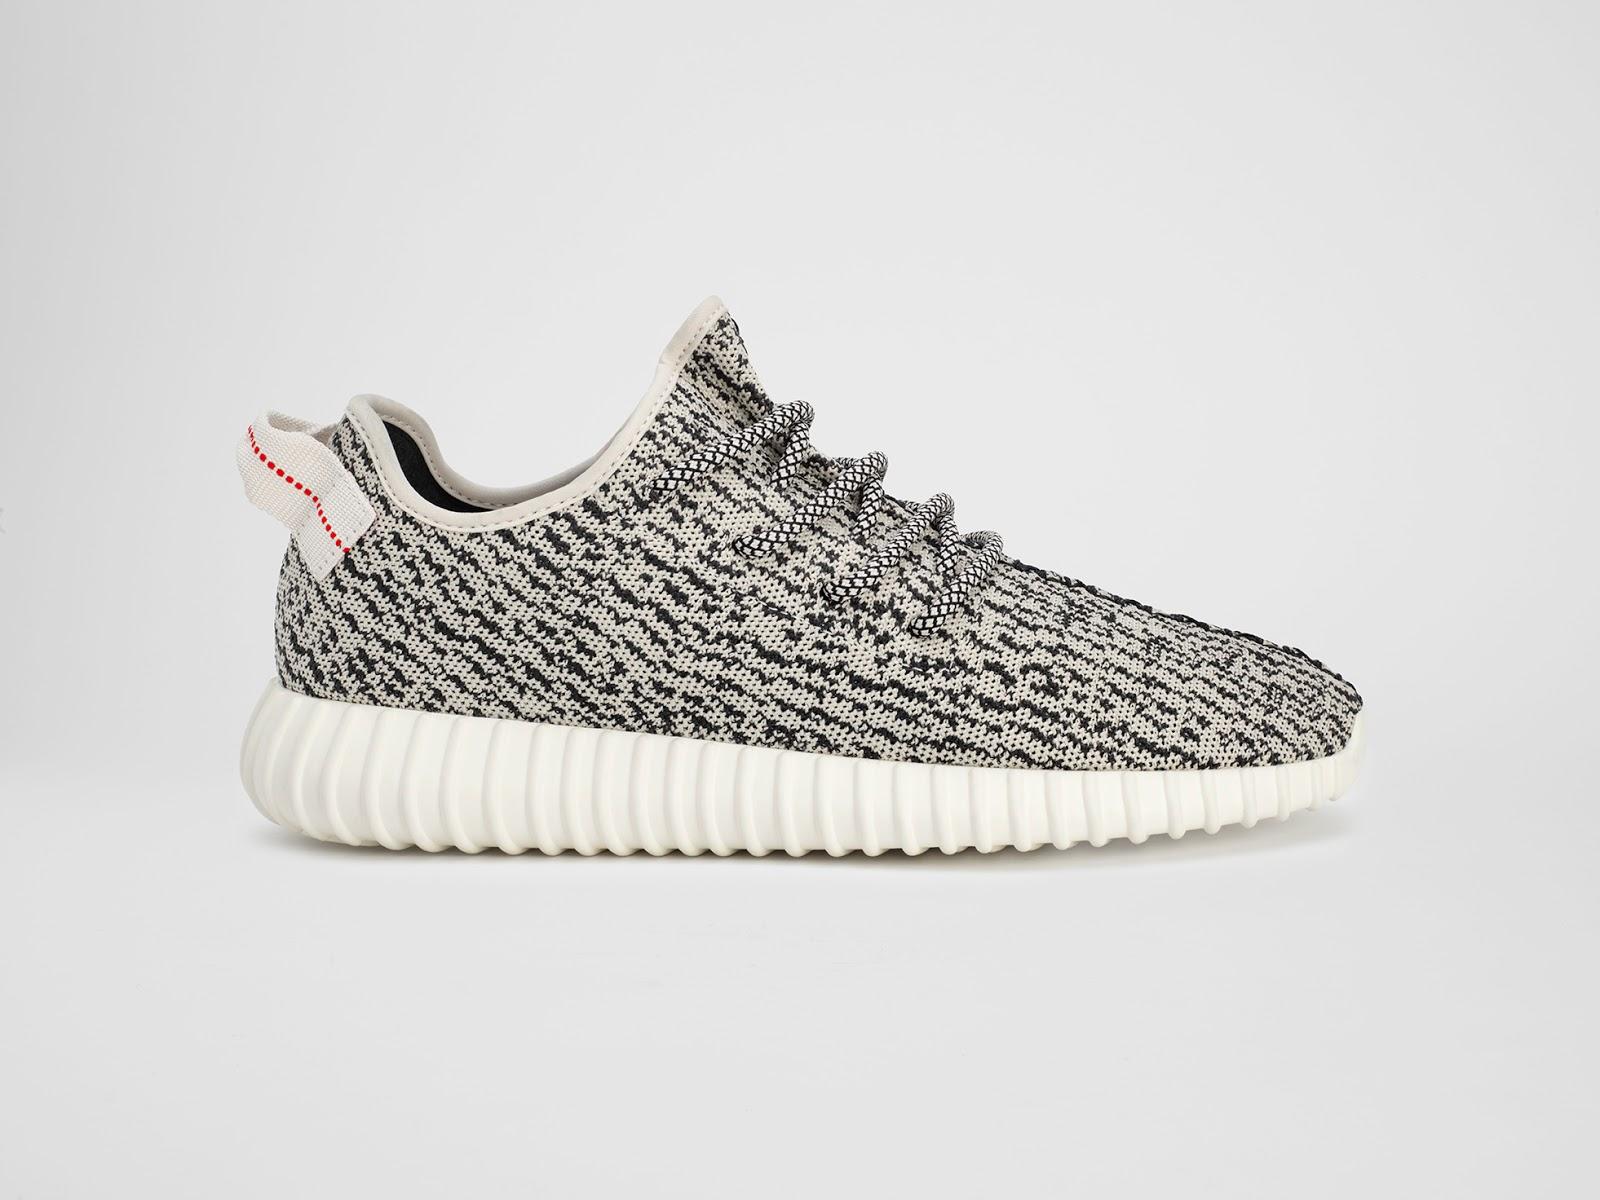 ... adidas Originals\u0027 Yeezy Boost 350 Kanye West ...